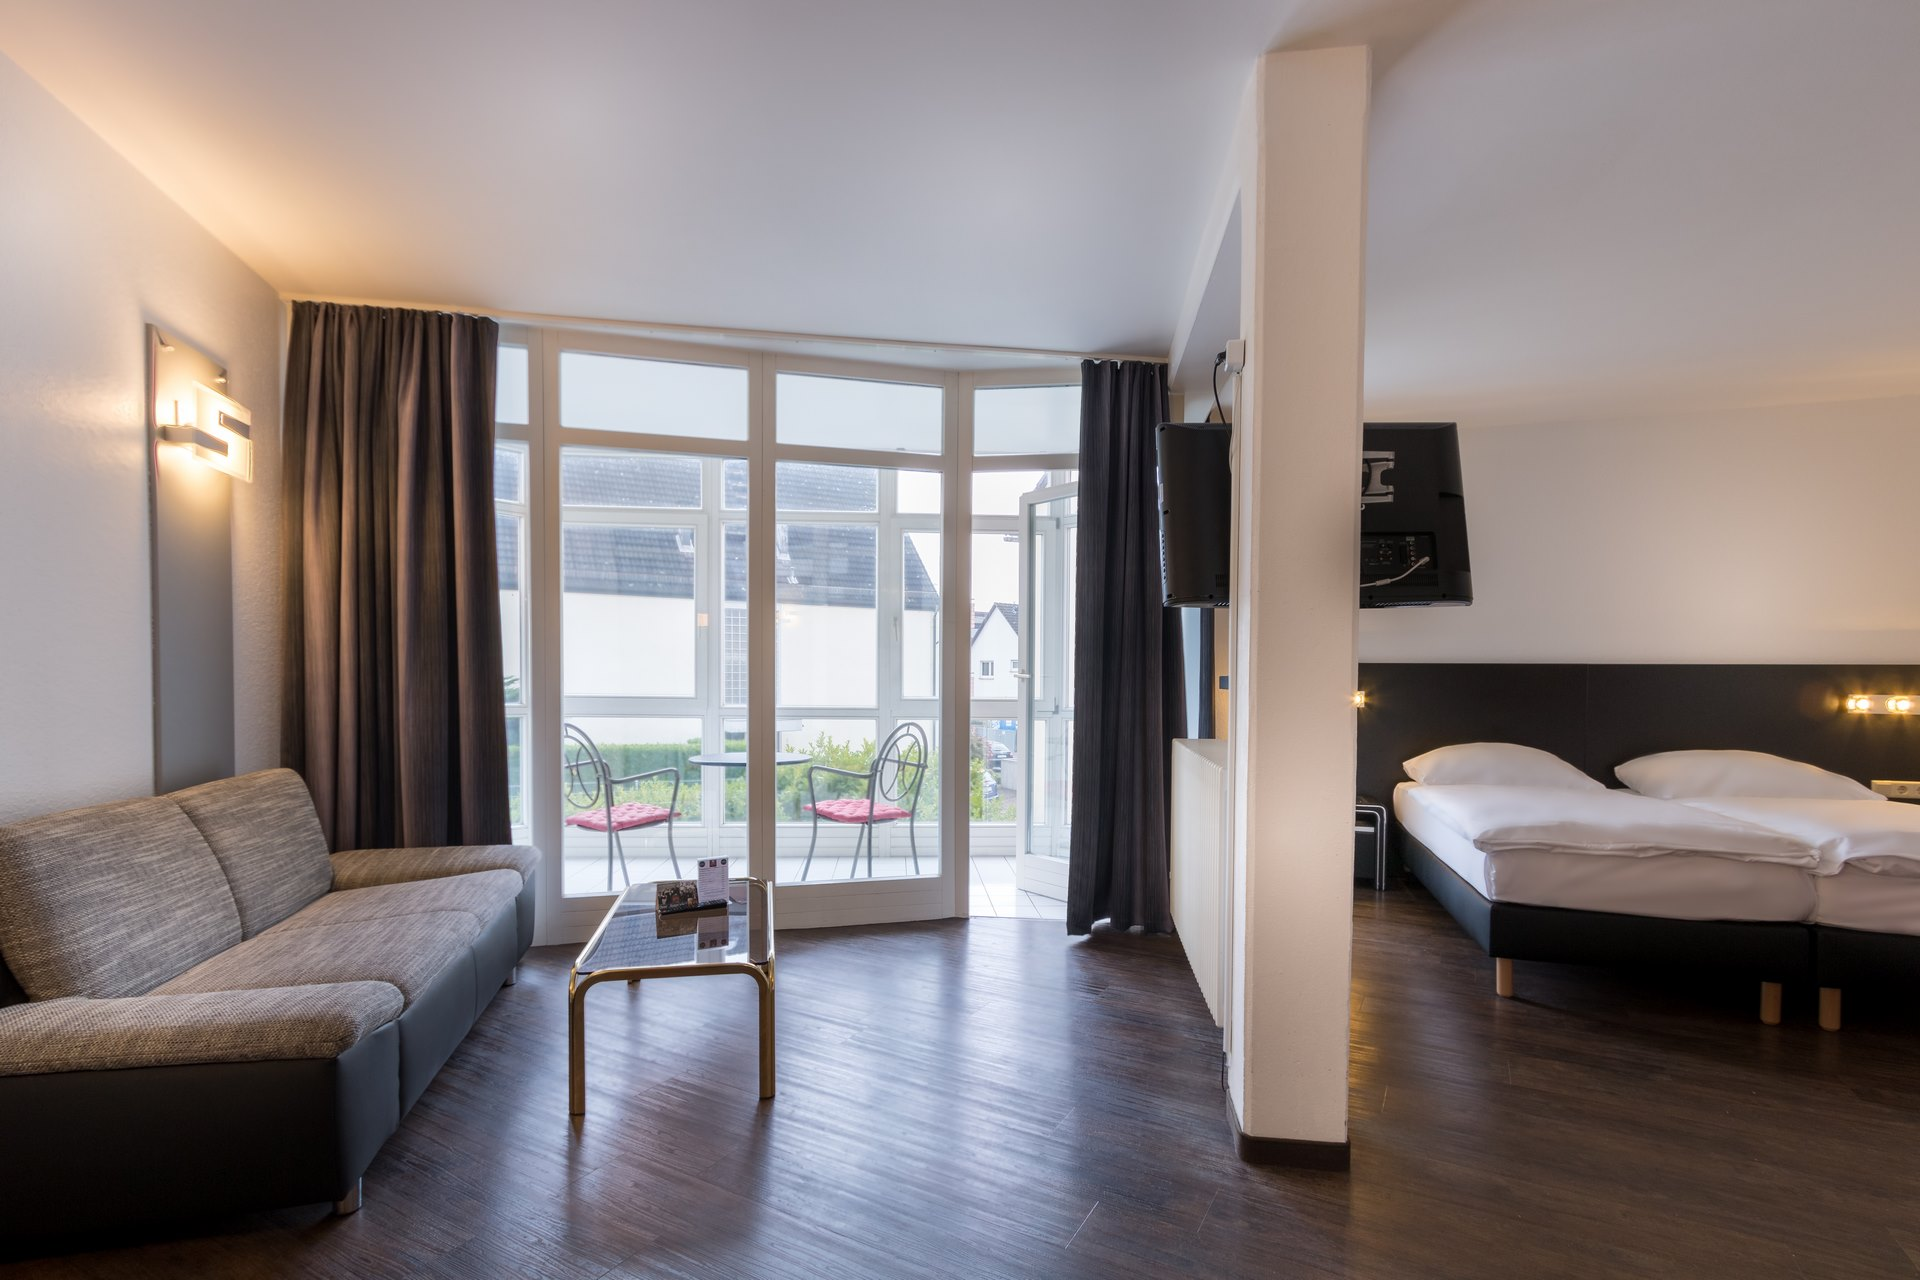 turm-hotel-dreieich-131